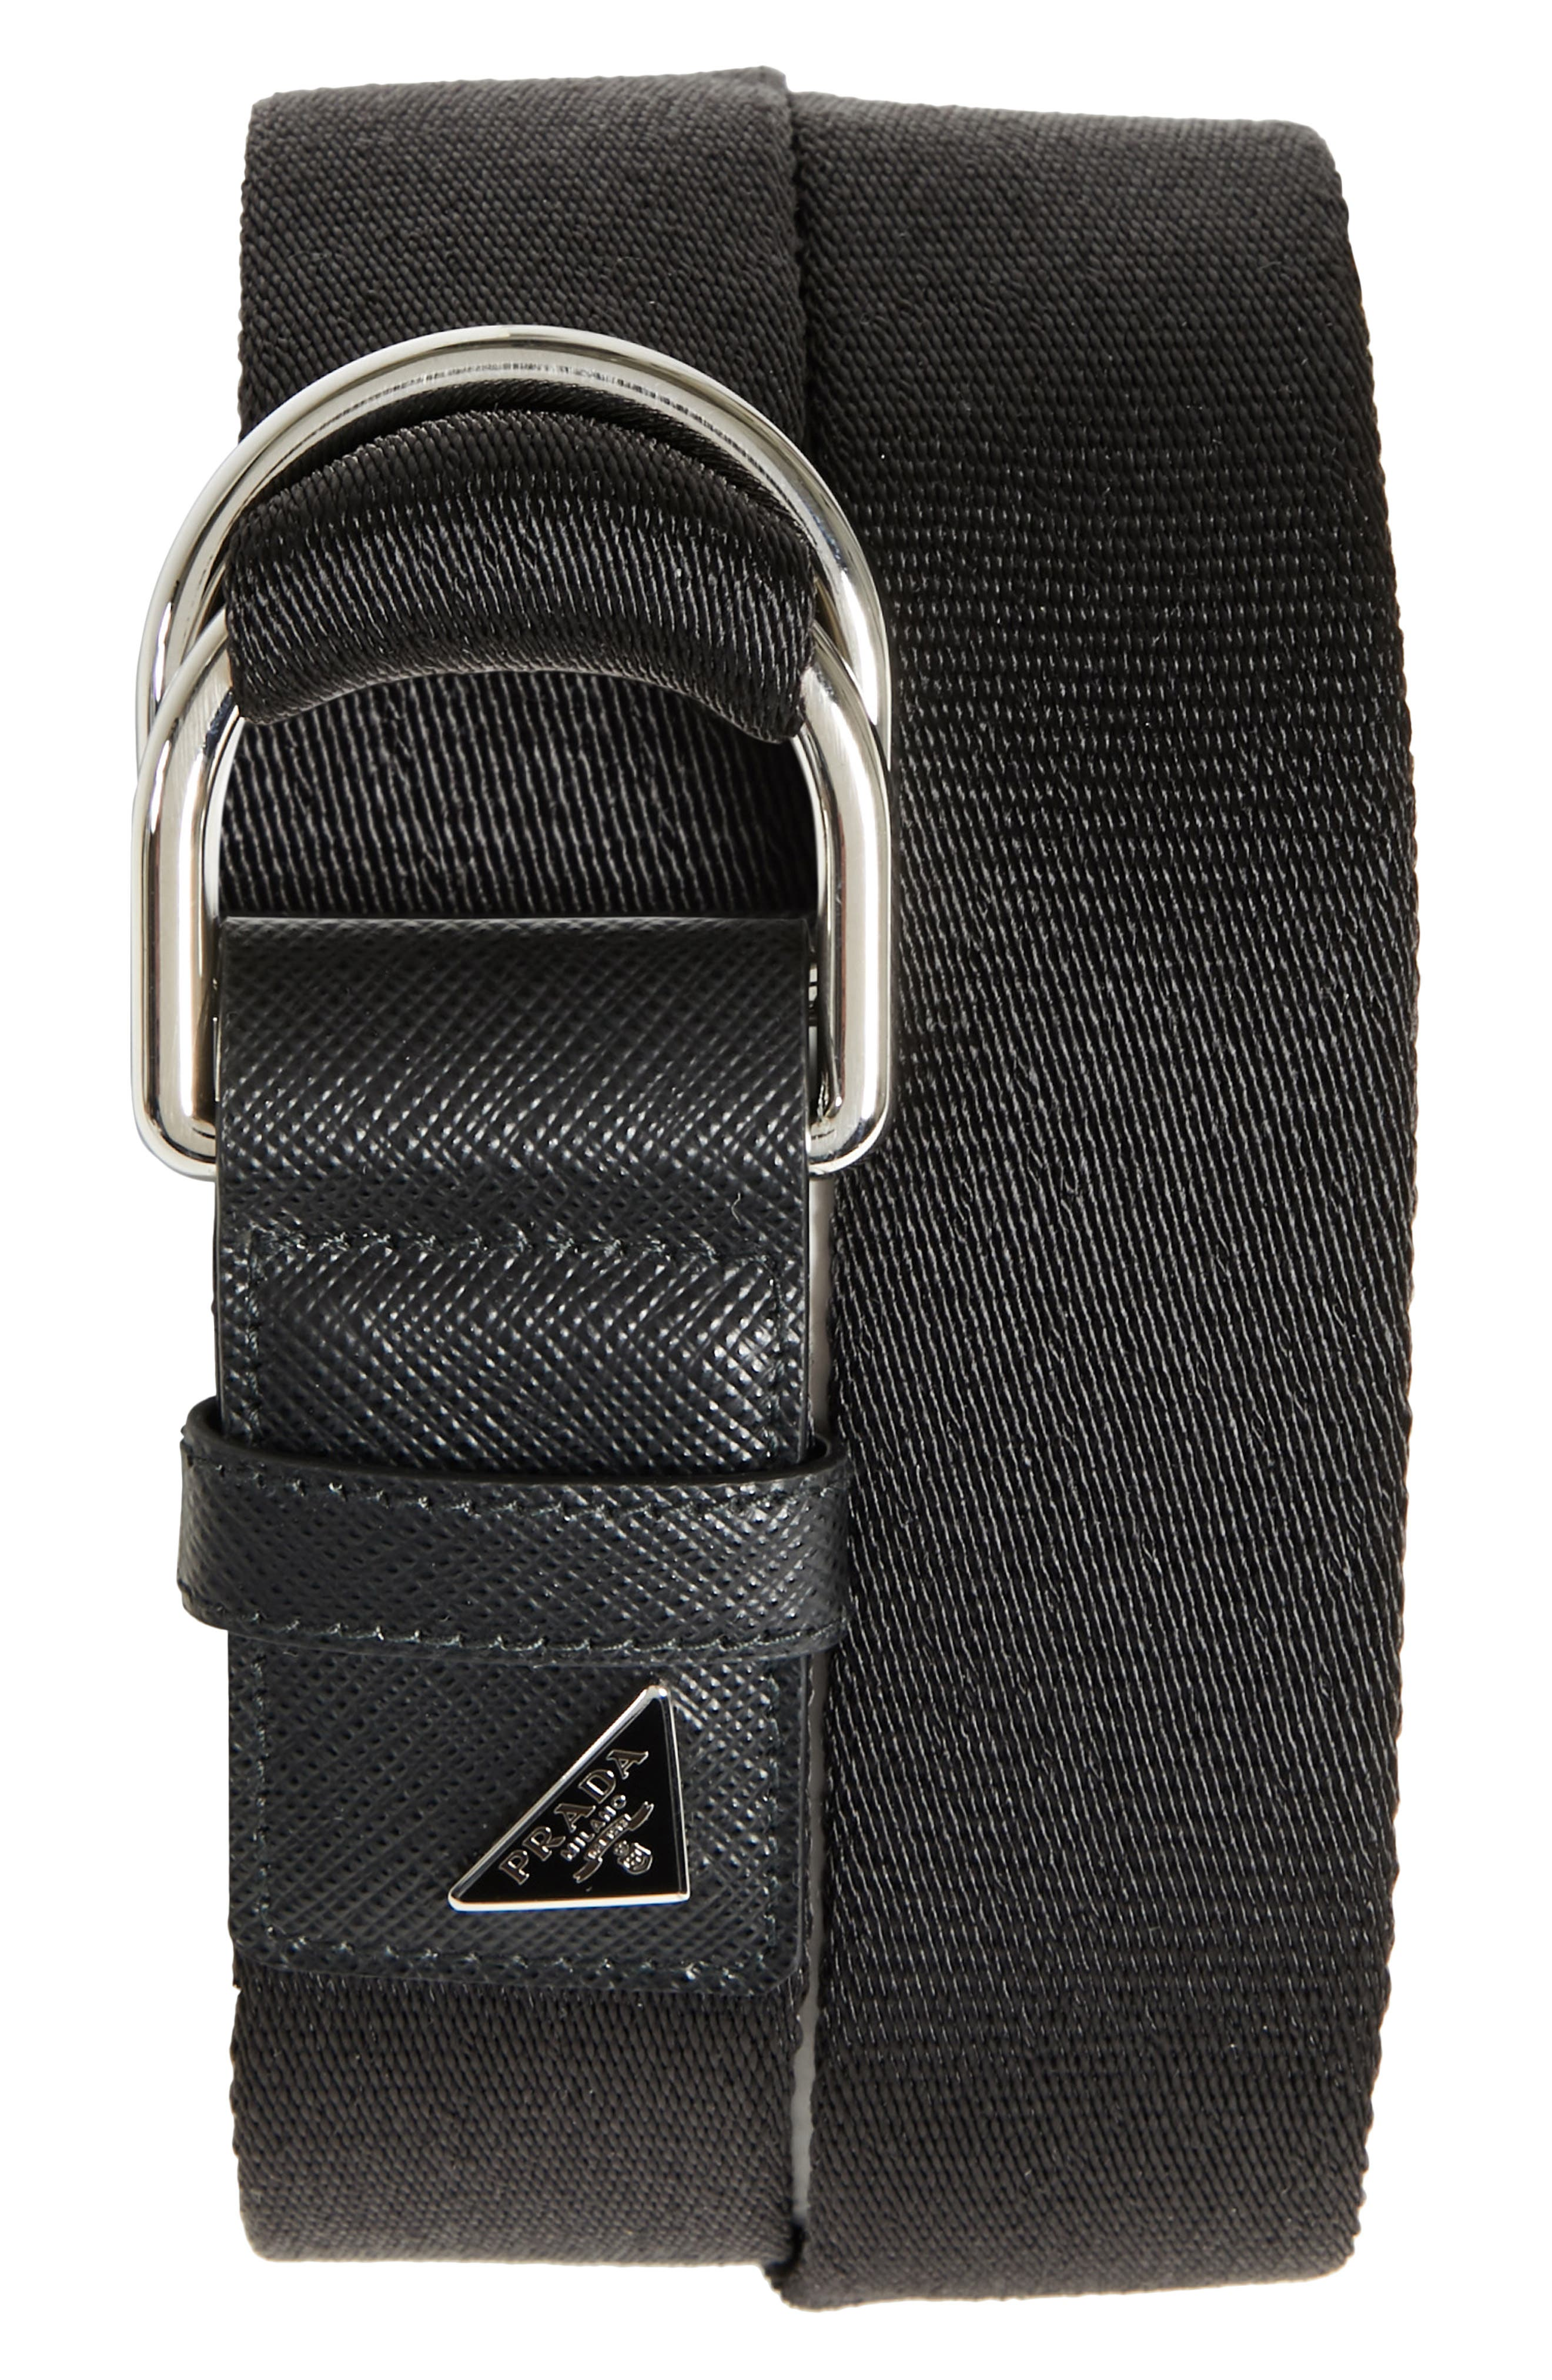 Prada Nastro Woven Belt